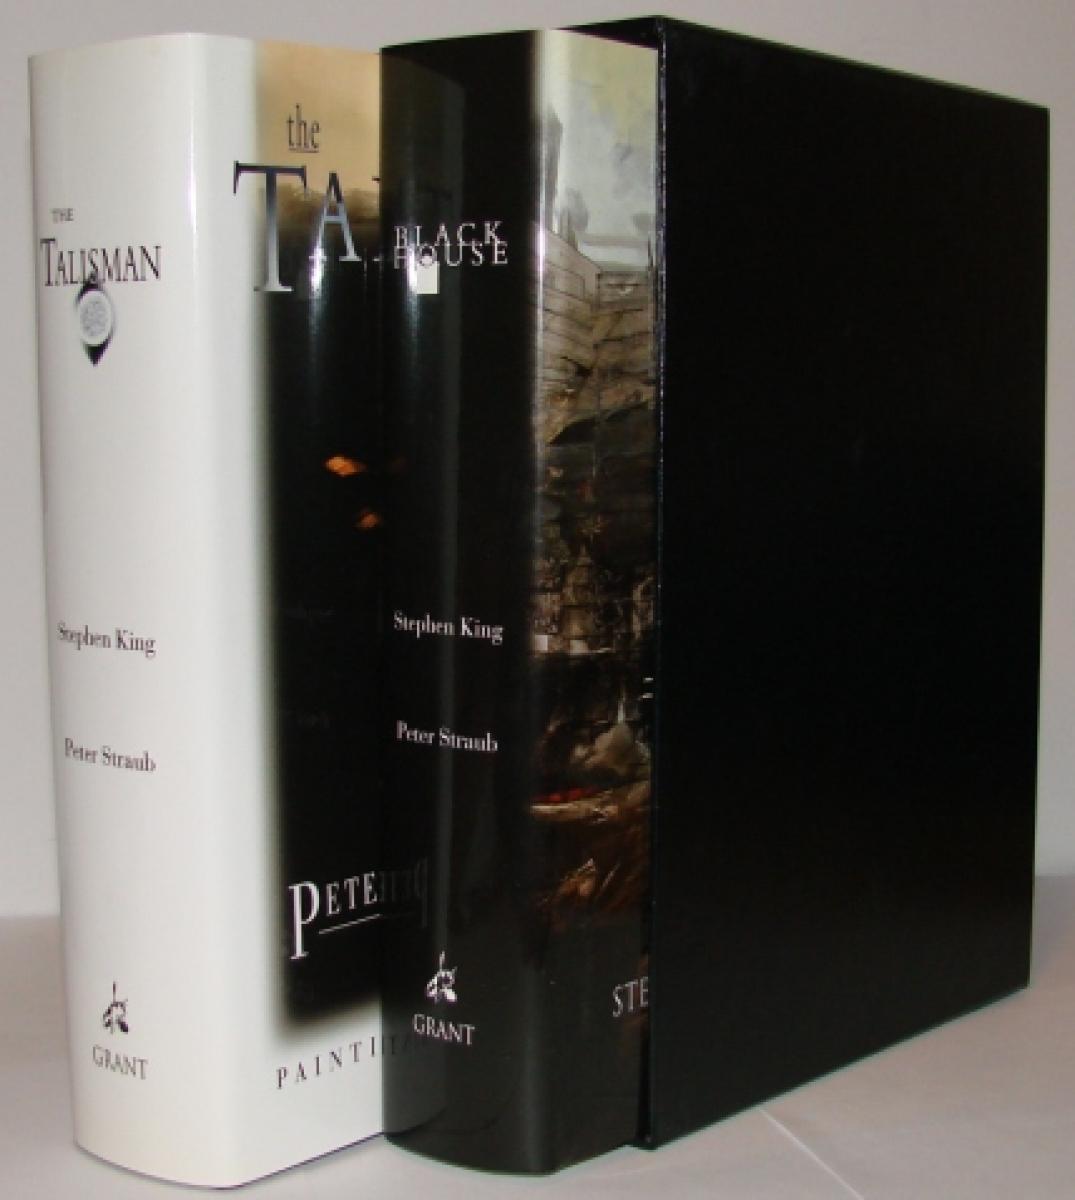 """The Talisman""/""Black House"" - książki w etui - obrazek"